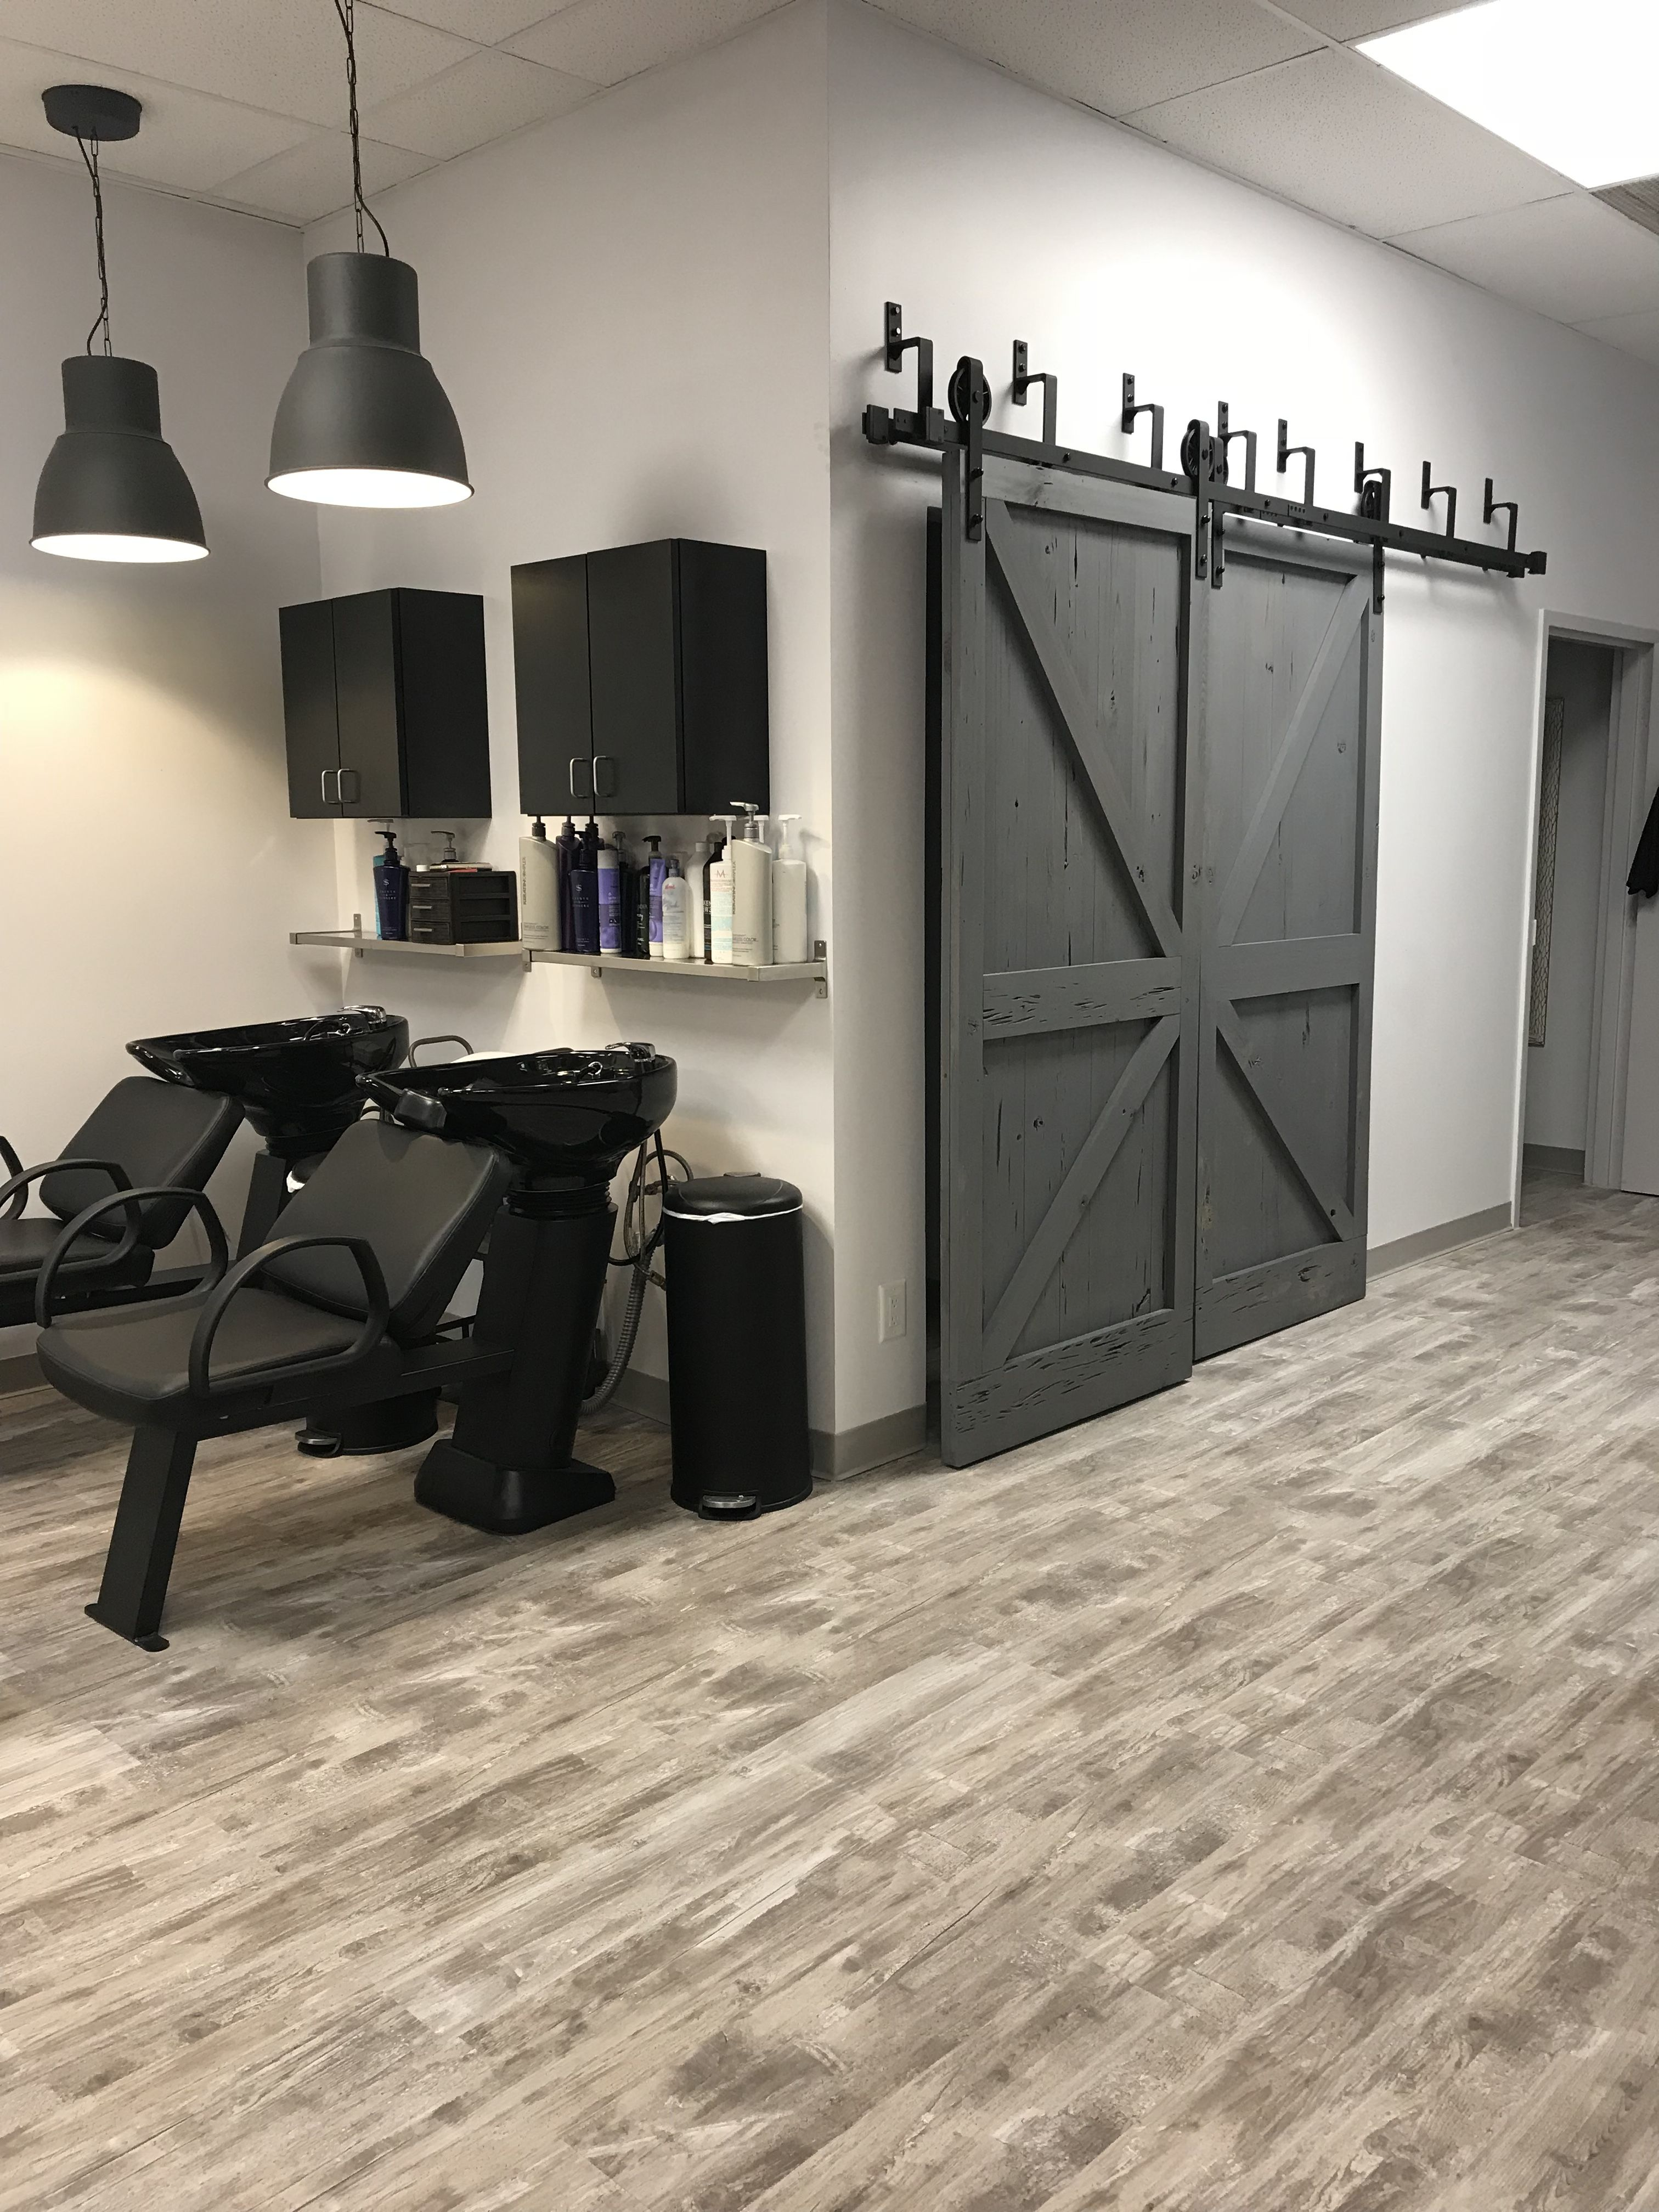 Home Spa Design Ideas: HT Salon Barn Doors & Shampoo Area